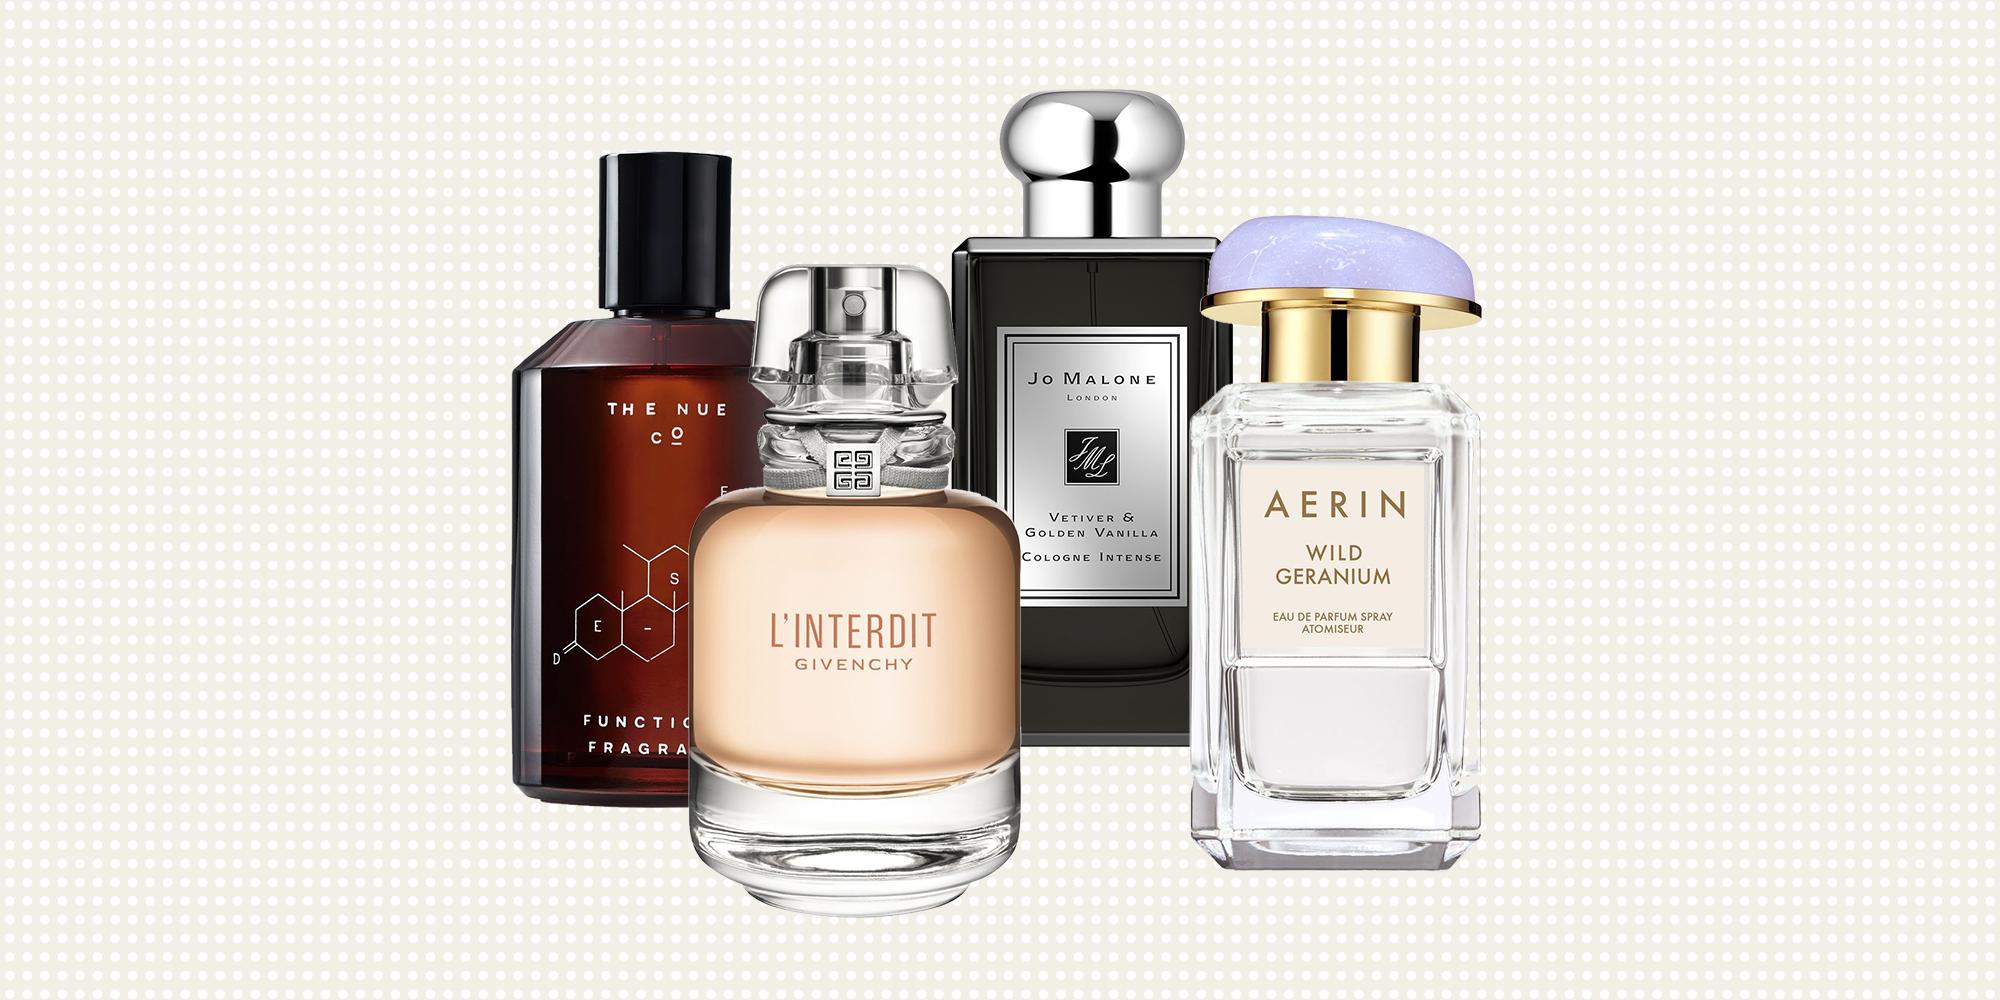 Fragrance Wholesale - Best Selling & Smelling